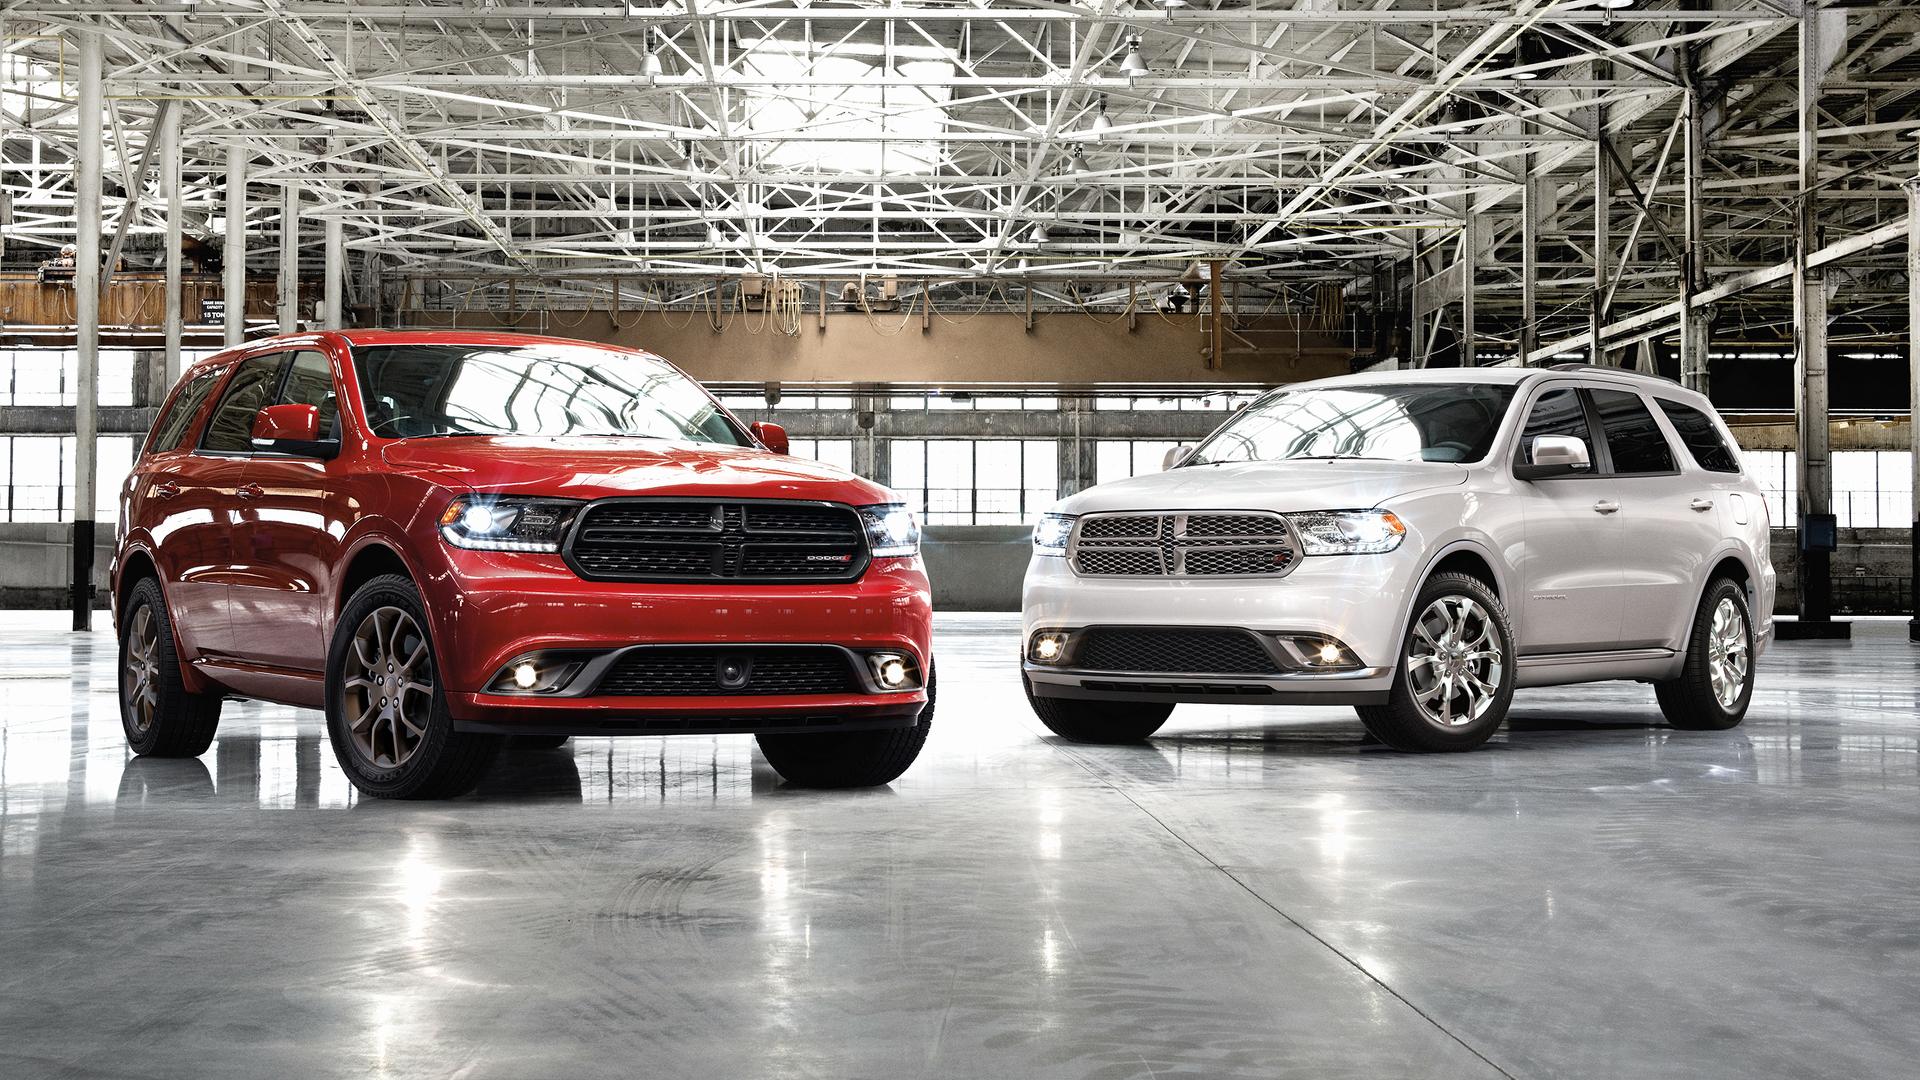 High Performance Dodge Durango Srt Could Arrive Next Year